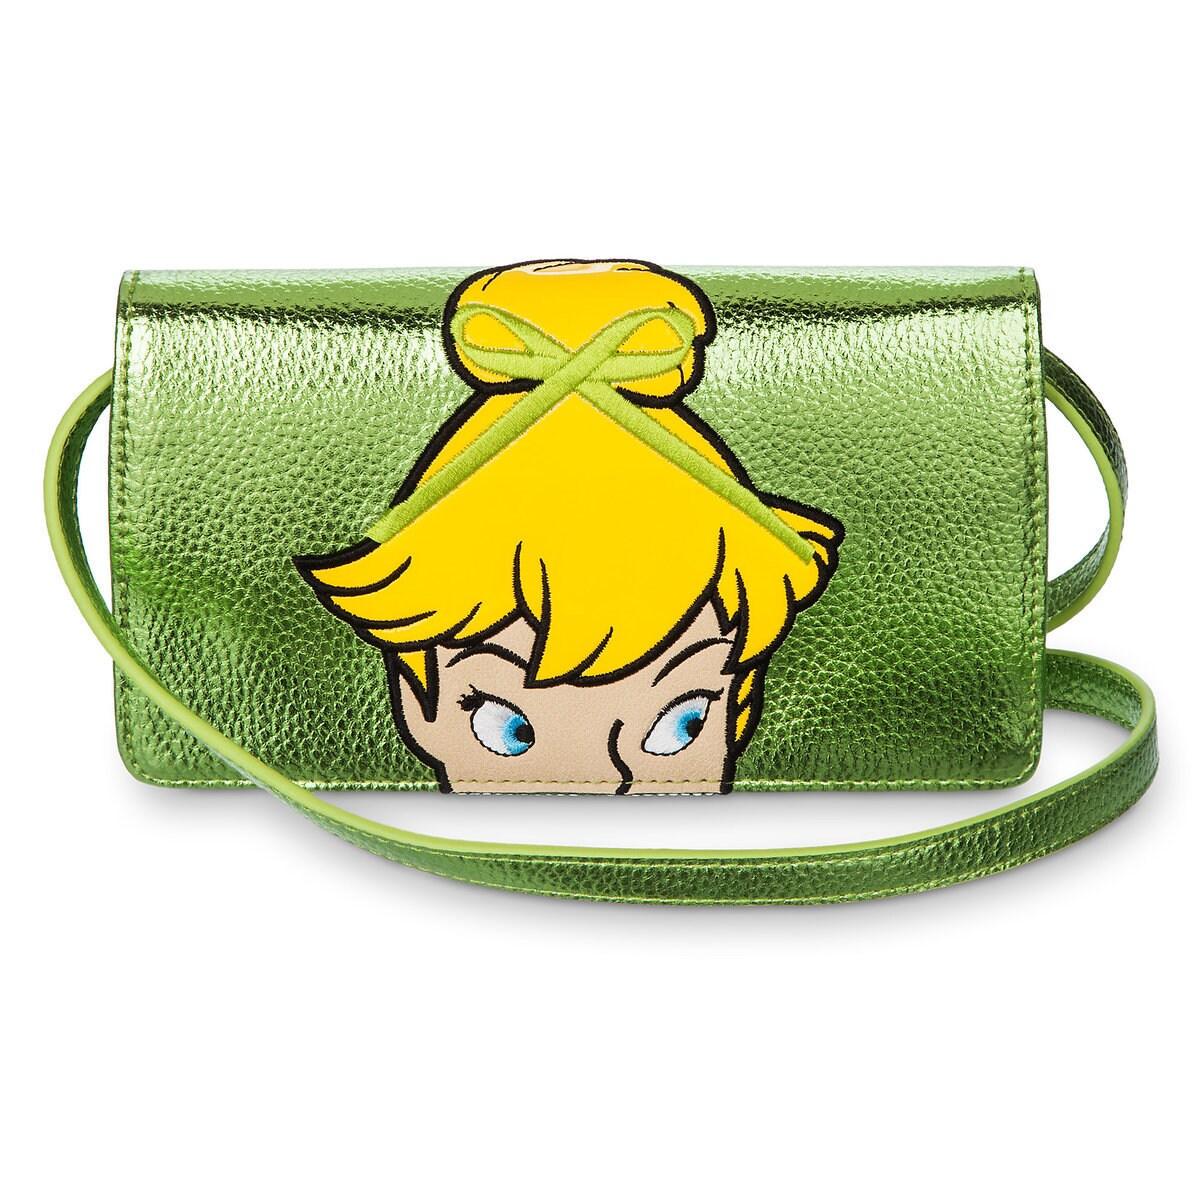 Product Image of Tinker Bell Phone Crossbody Bag - Danielle Nicole # 1